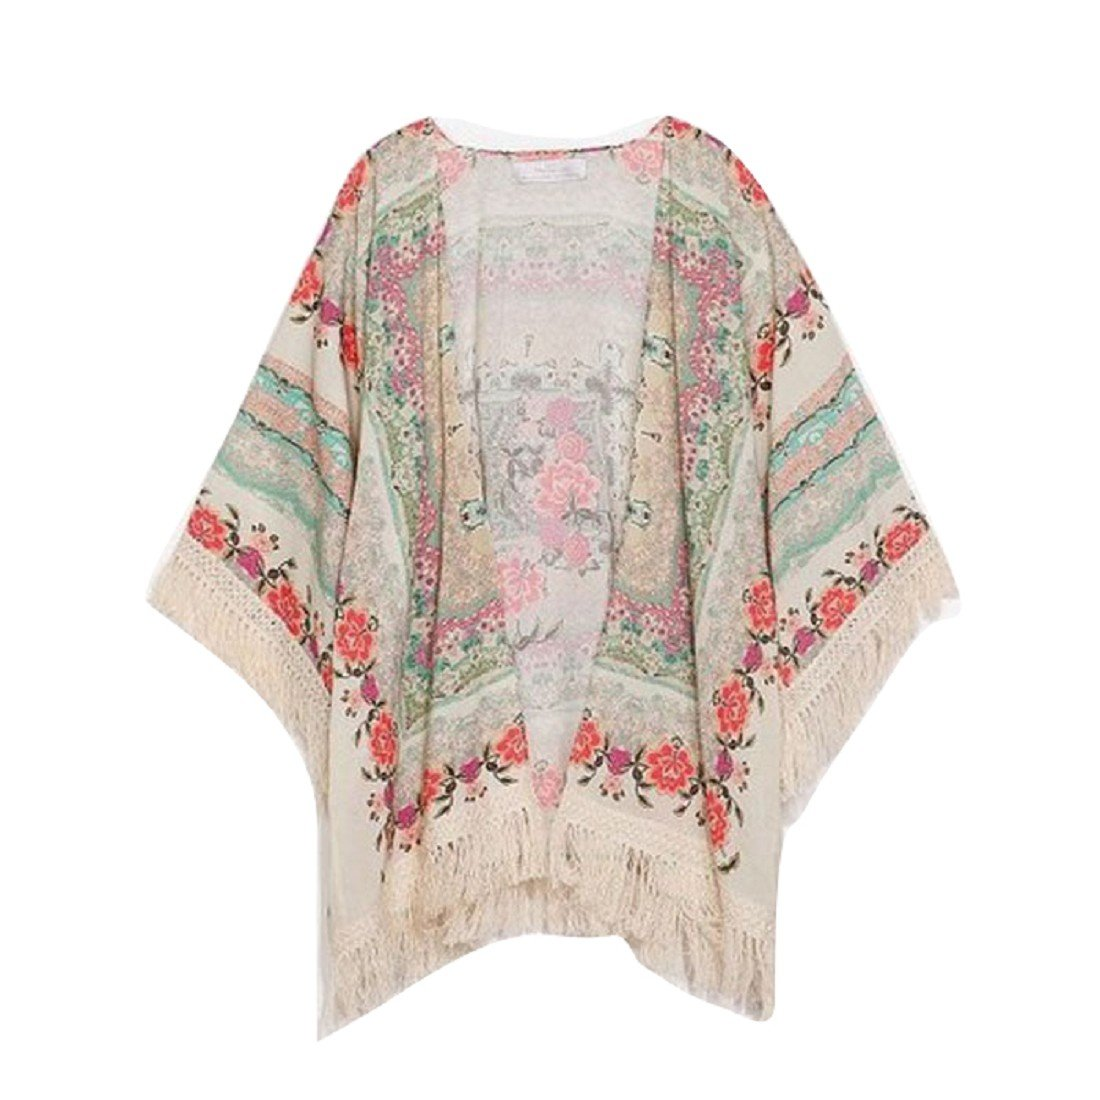 Tongshi Mujeres Impreso Floral de la Gasa de la Rebeca de la Borla mant/ón Kimono Chaqueta Top